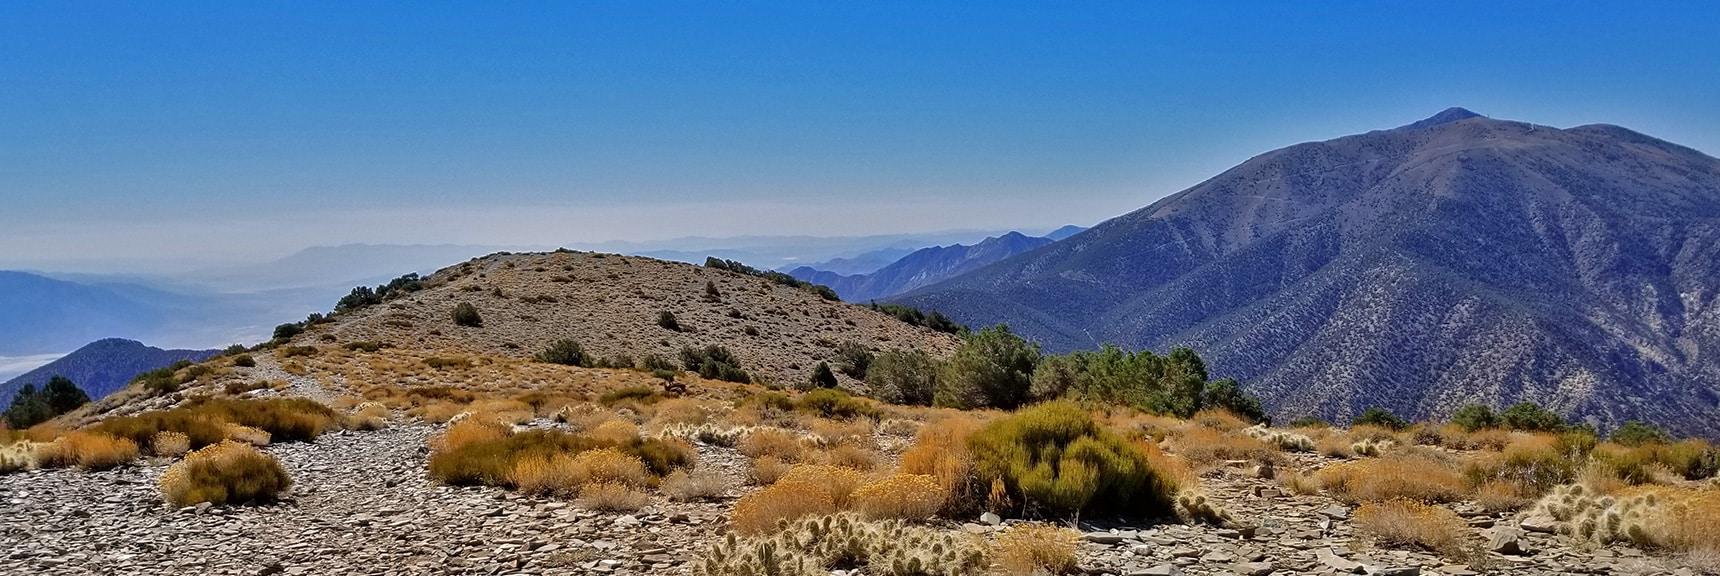 View of South Summit, Rogers, Bennett and Telescope Peaks from Wildrose Peak Mid Summit Area   Wildrose Peak   Panamint Mountain Range   Death Valley National Park, California